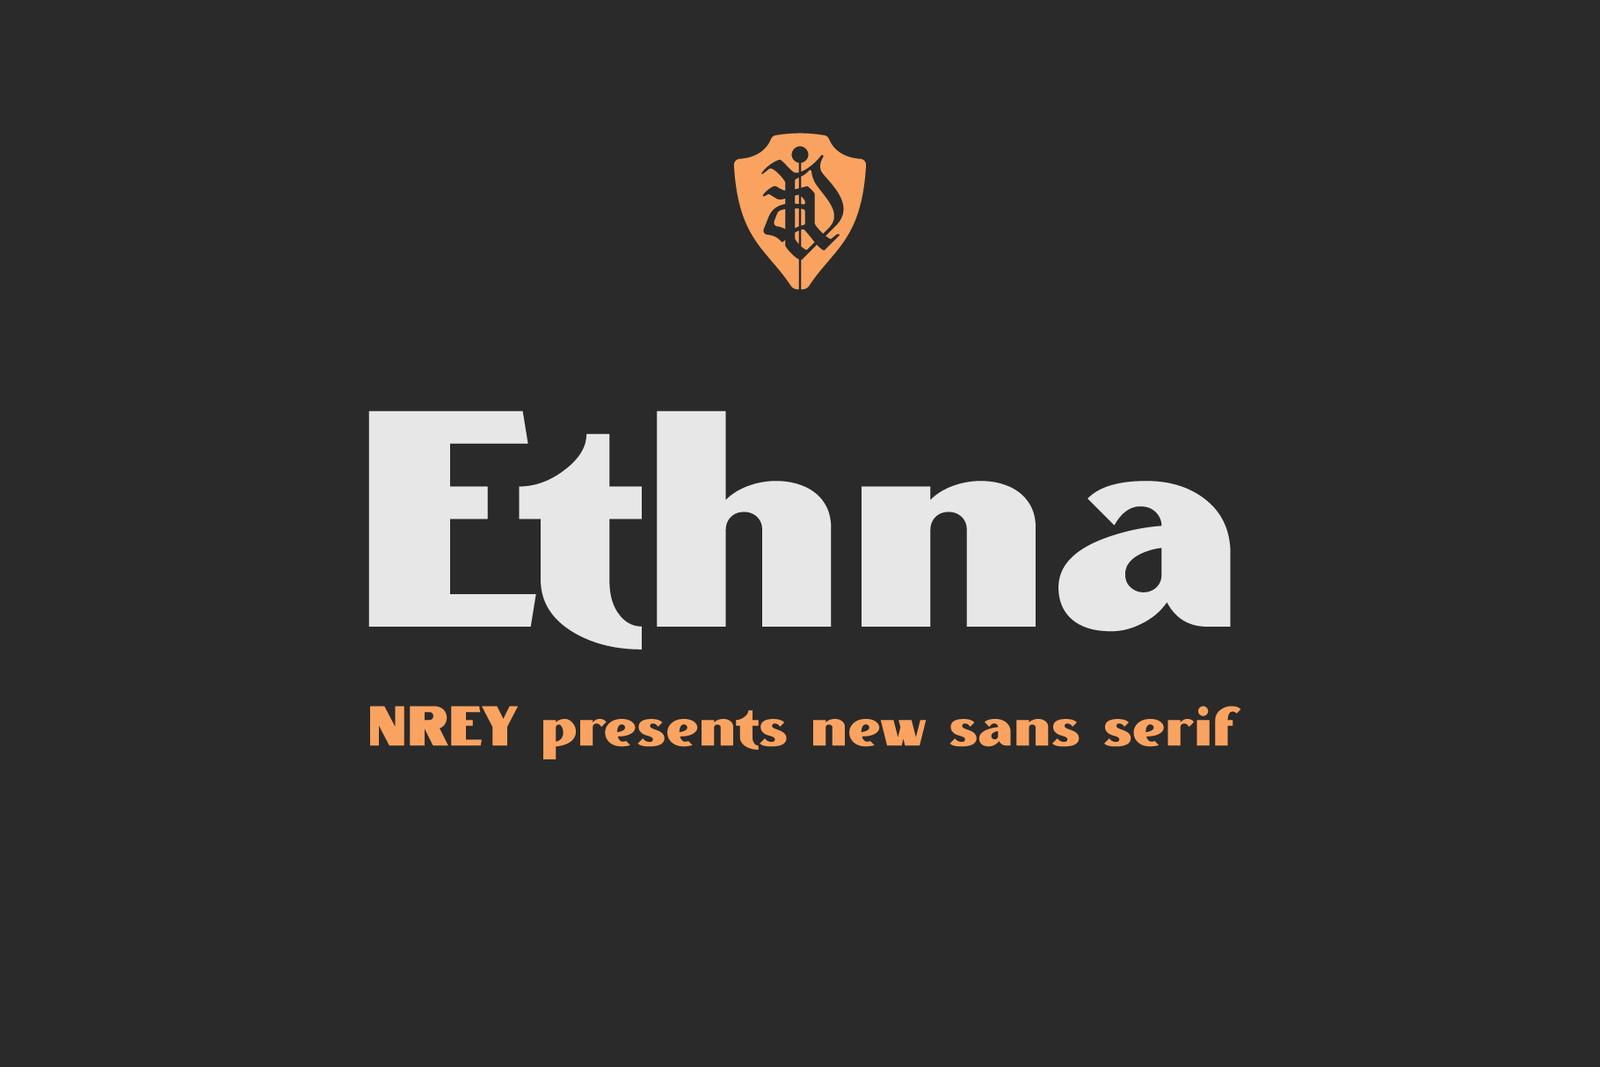 Ethna Black